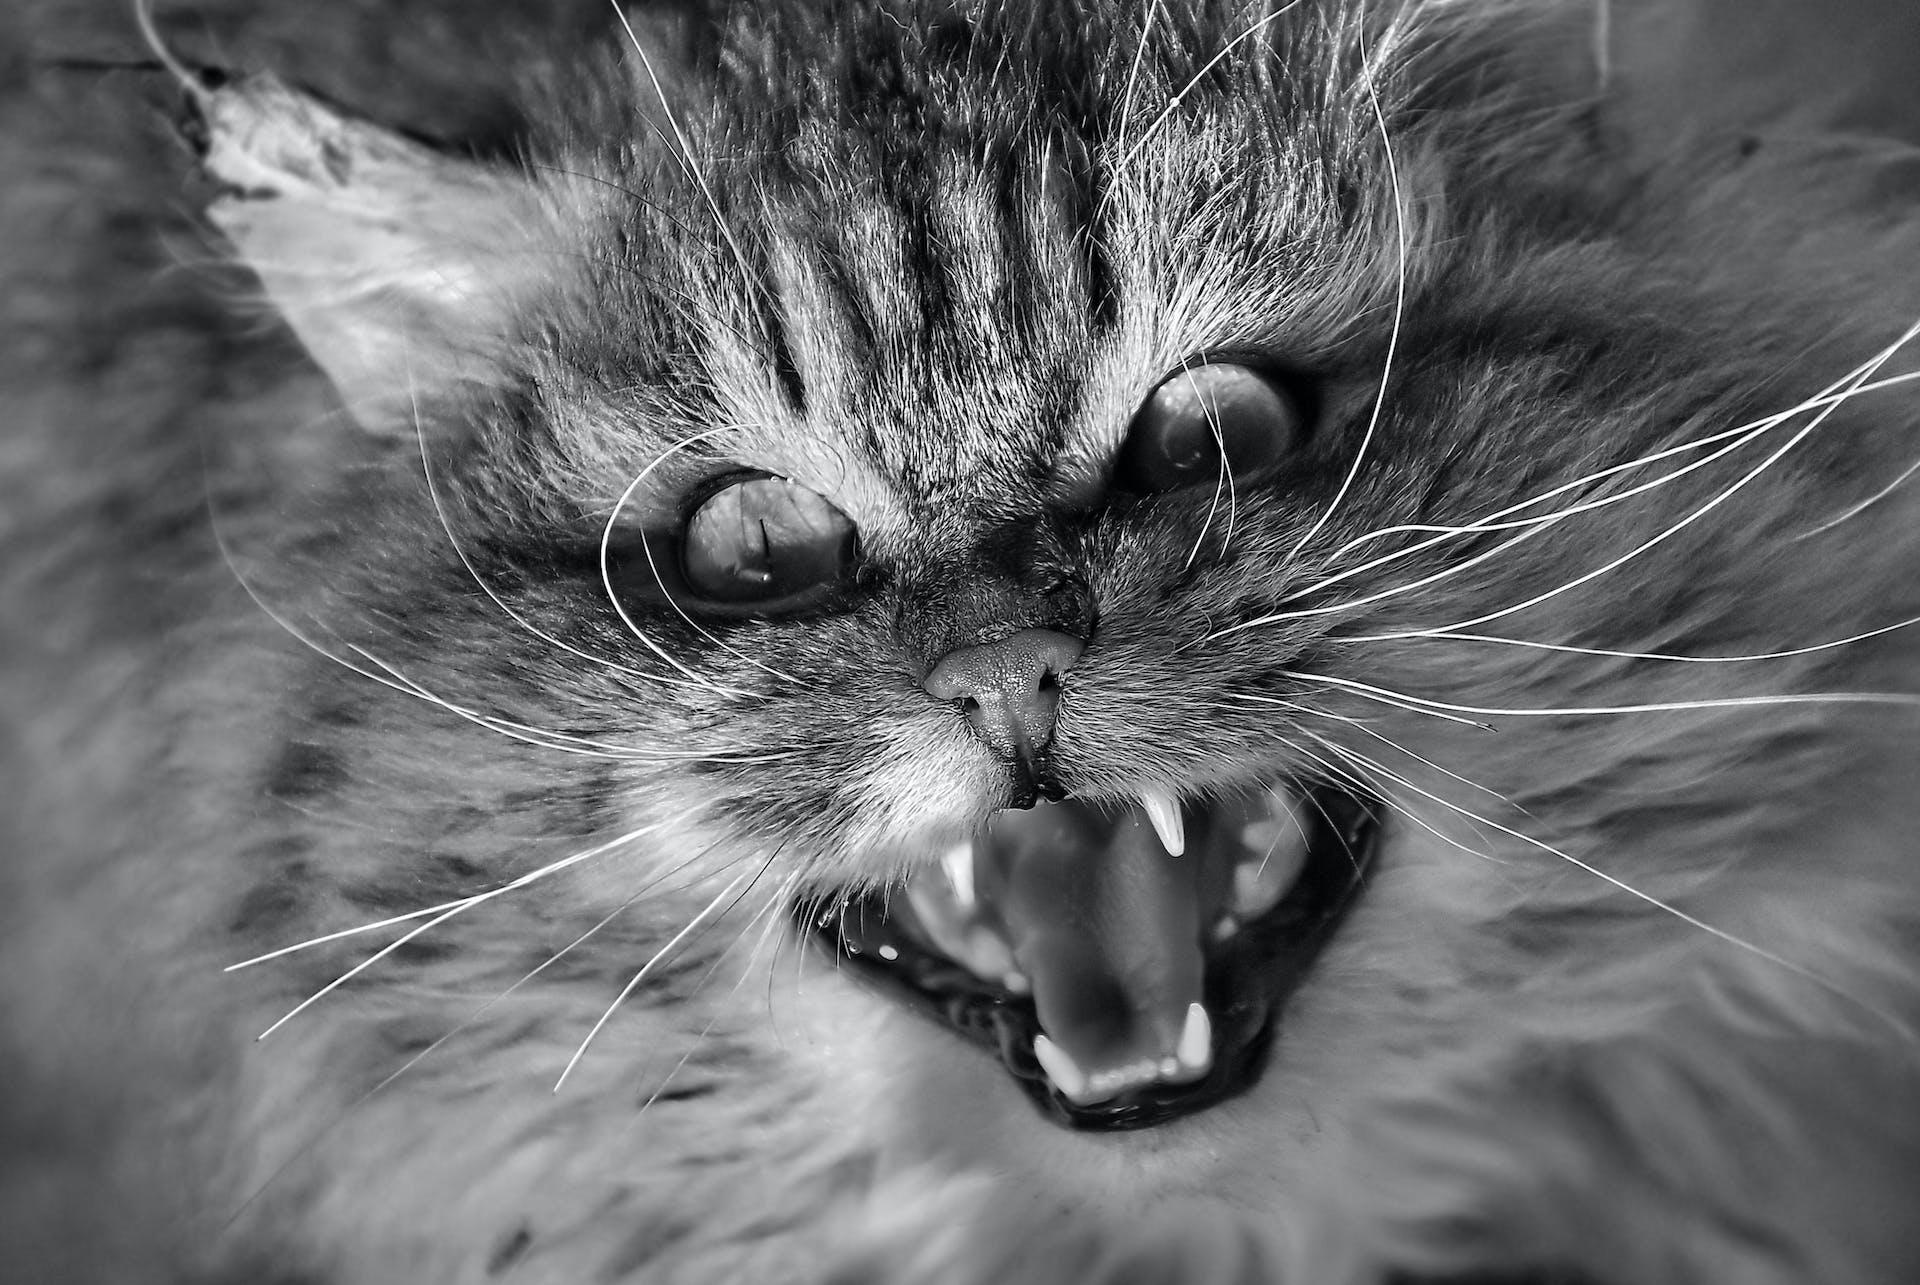 Kissa paha